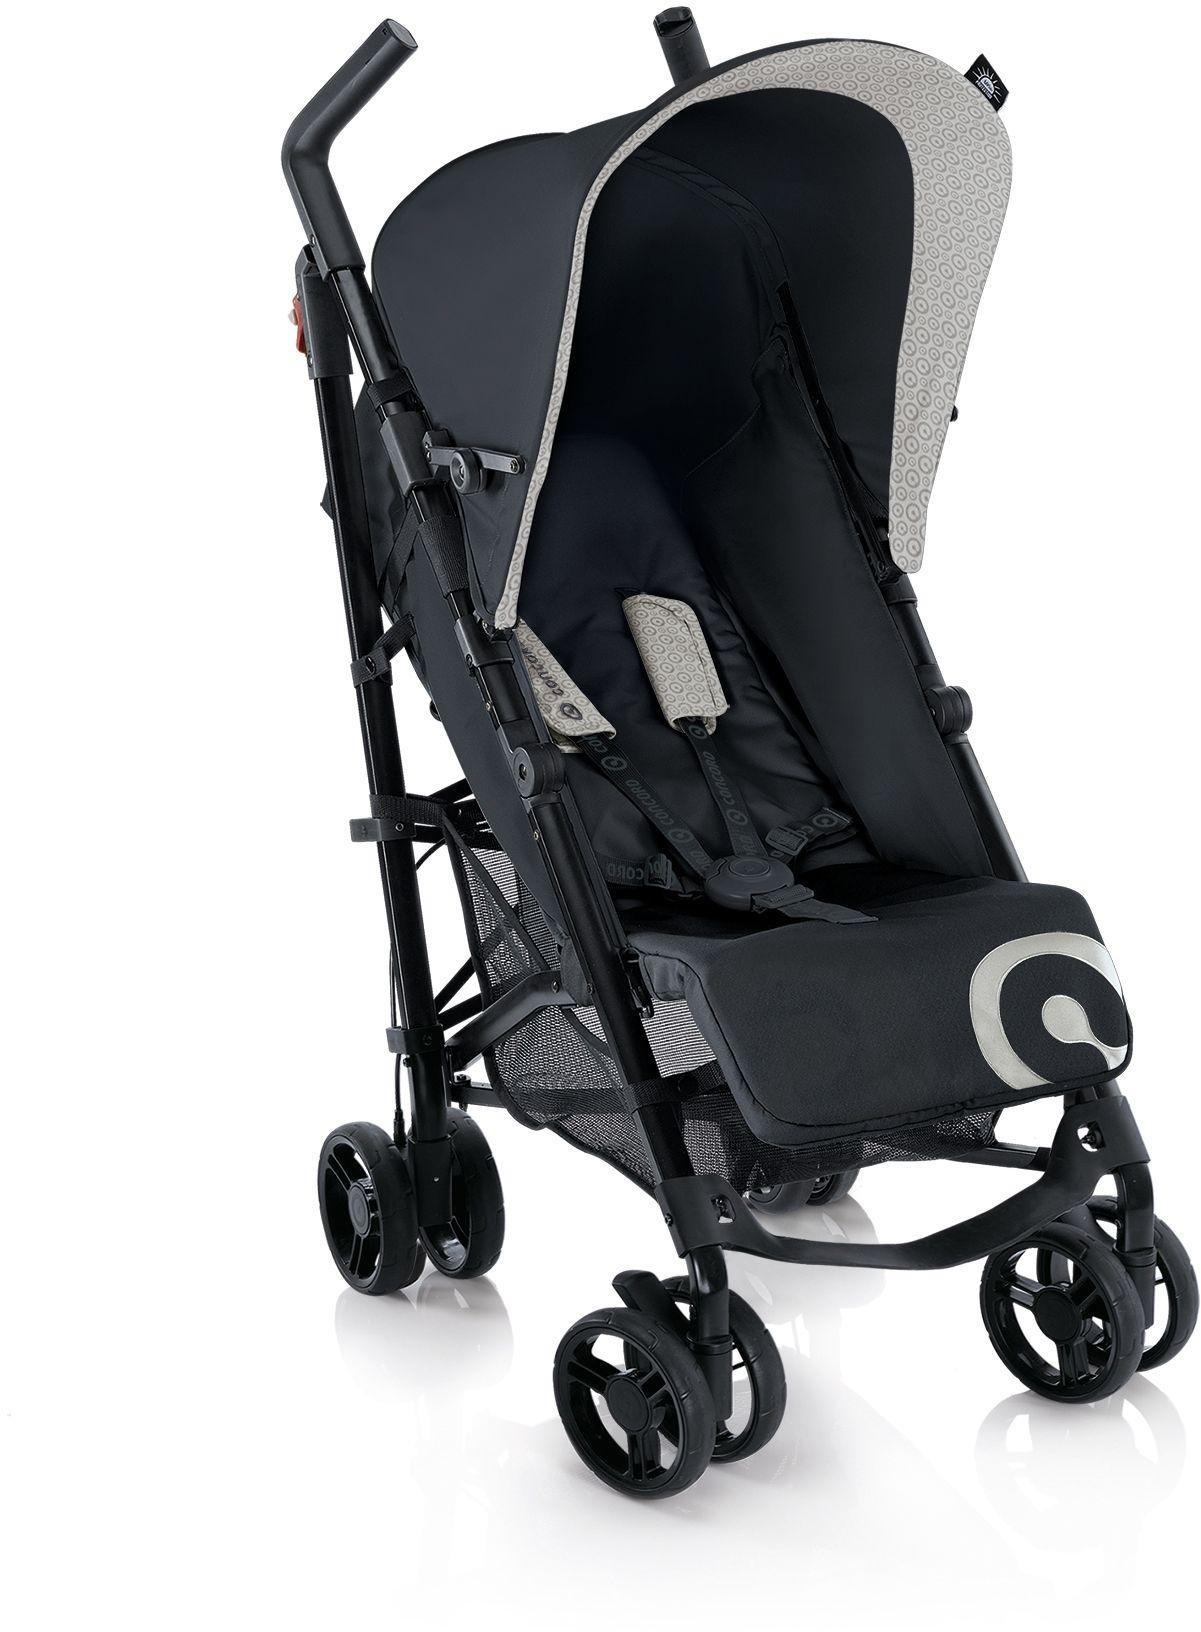 Image of Concord Quix - Stroller - Phantom Black